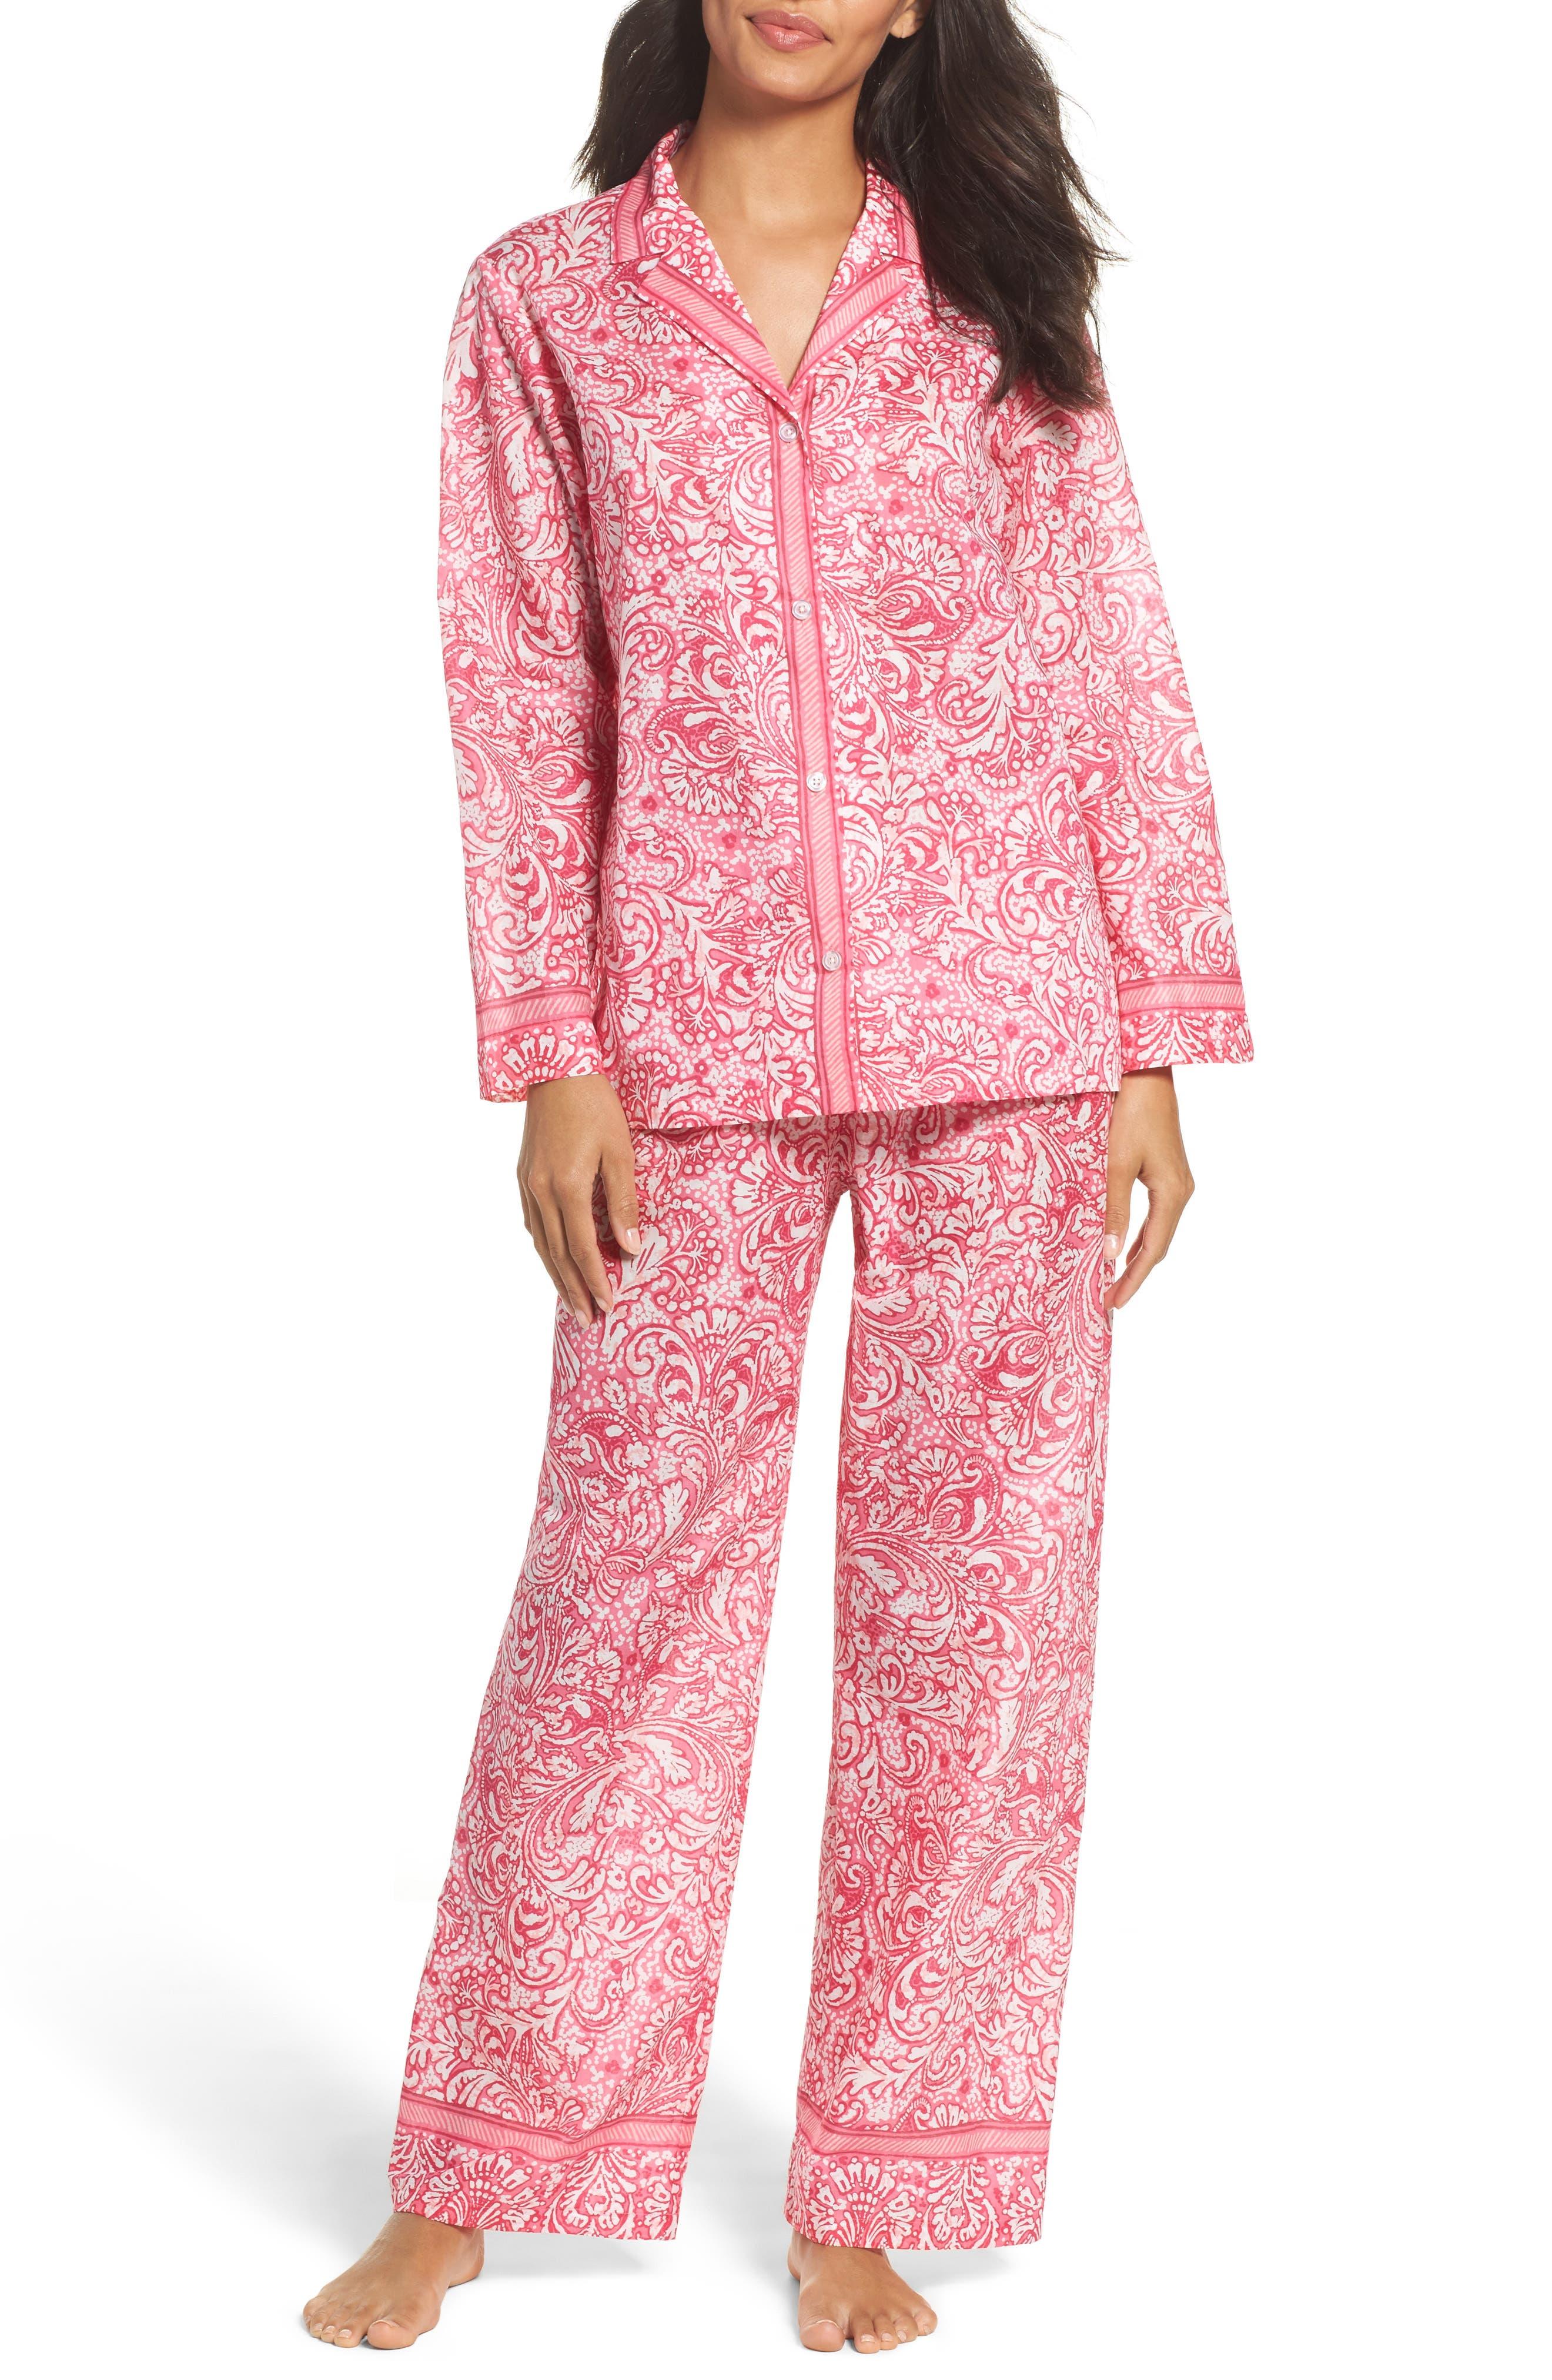 Oscar de la Renta Paisley Cotton Pajamas